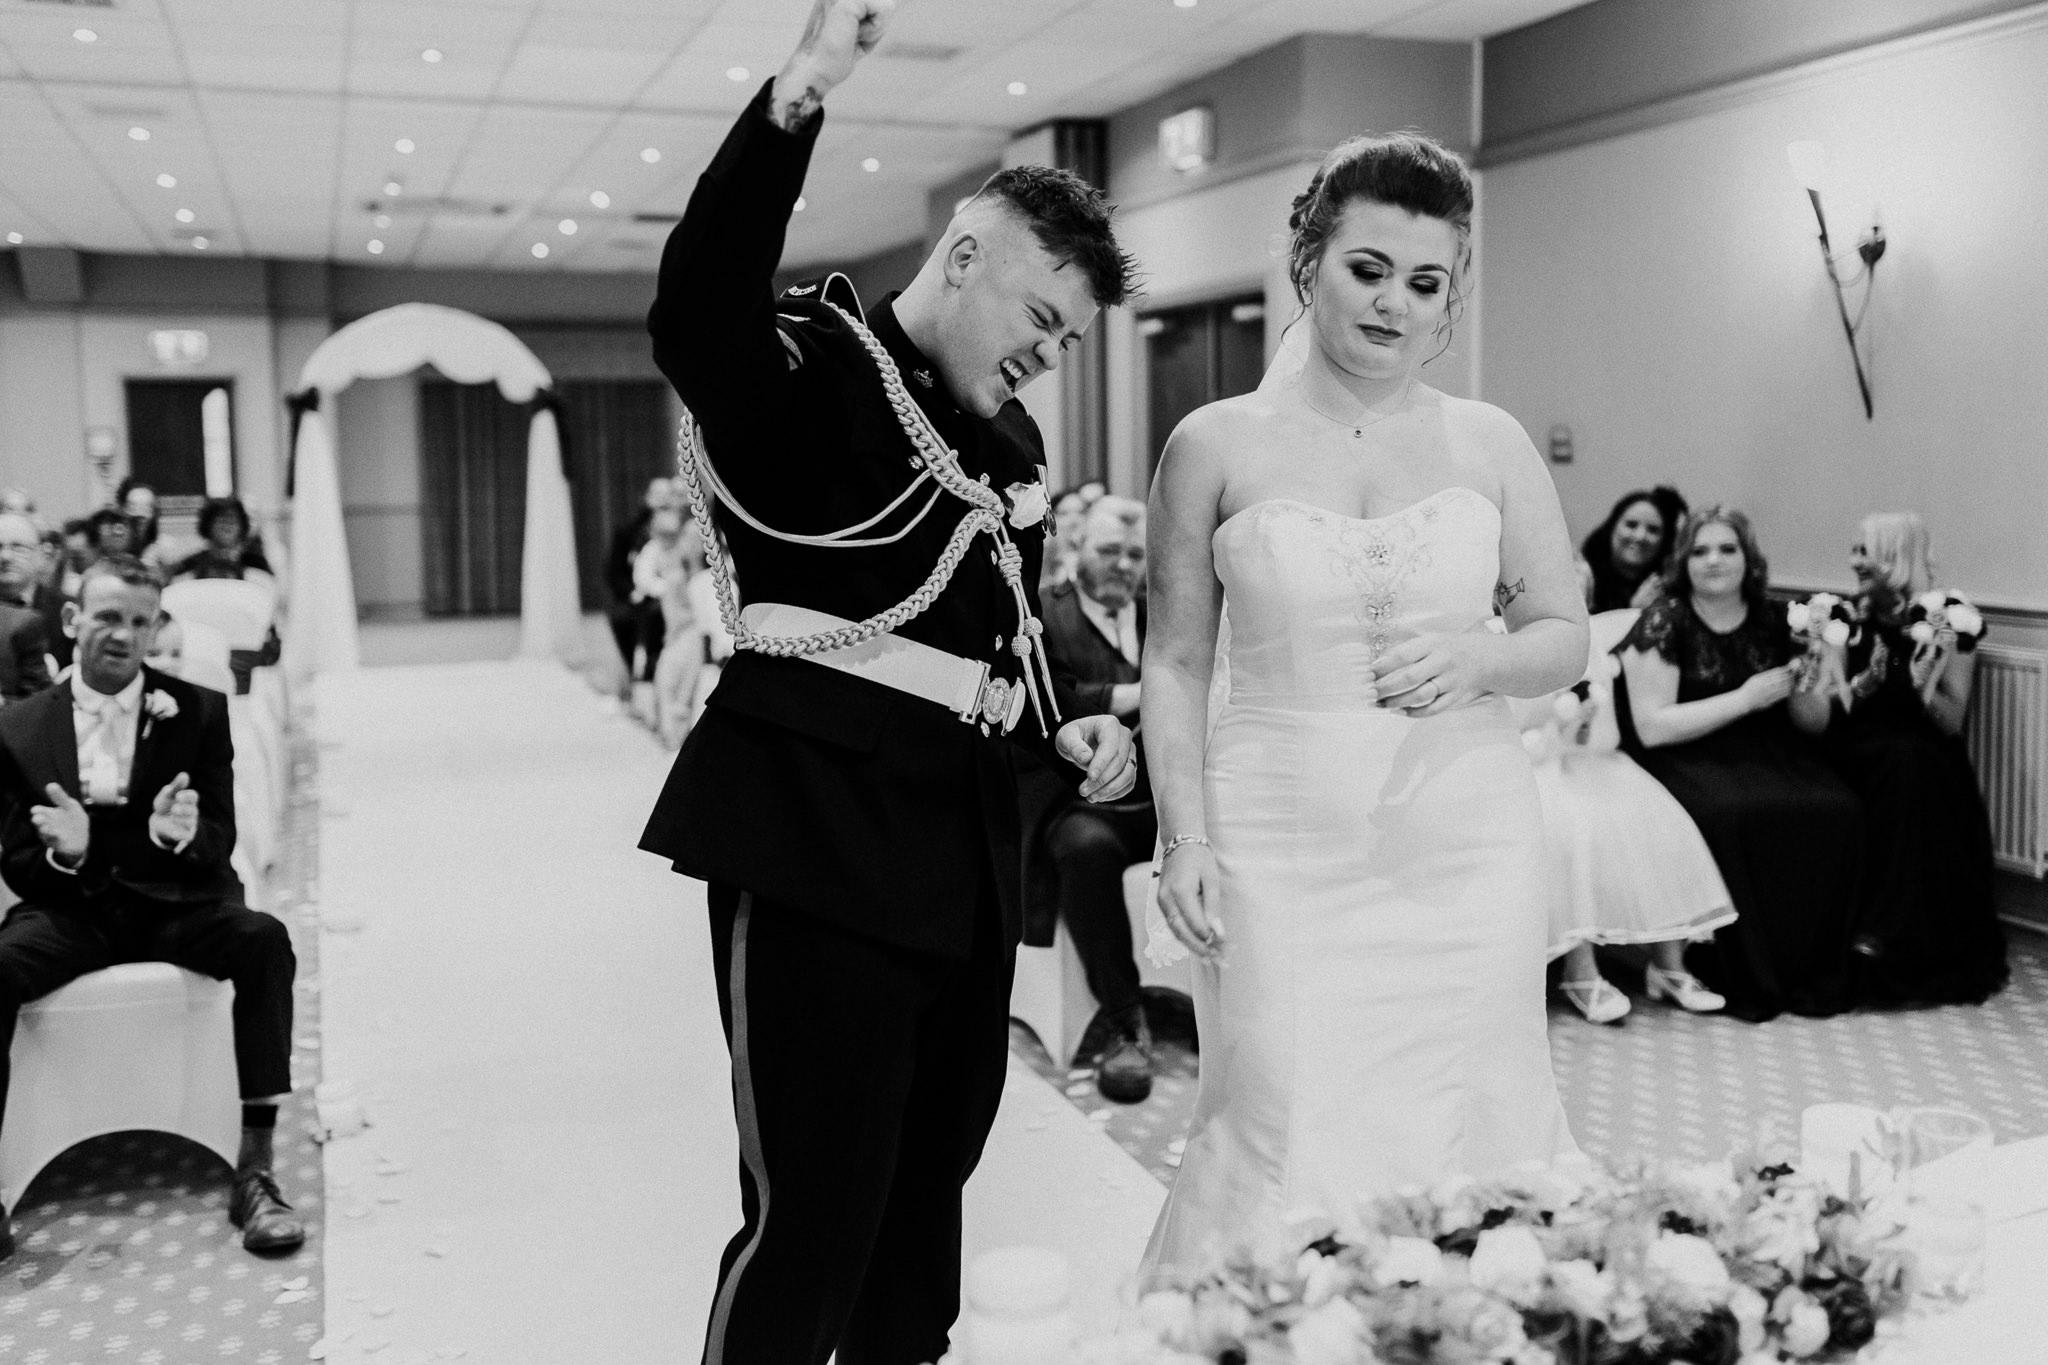 Mollingtonbanastre_wedding-12.jpg